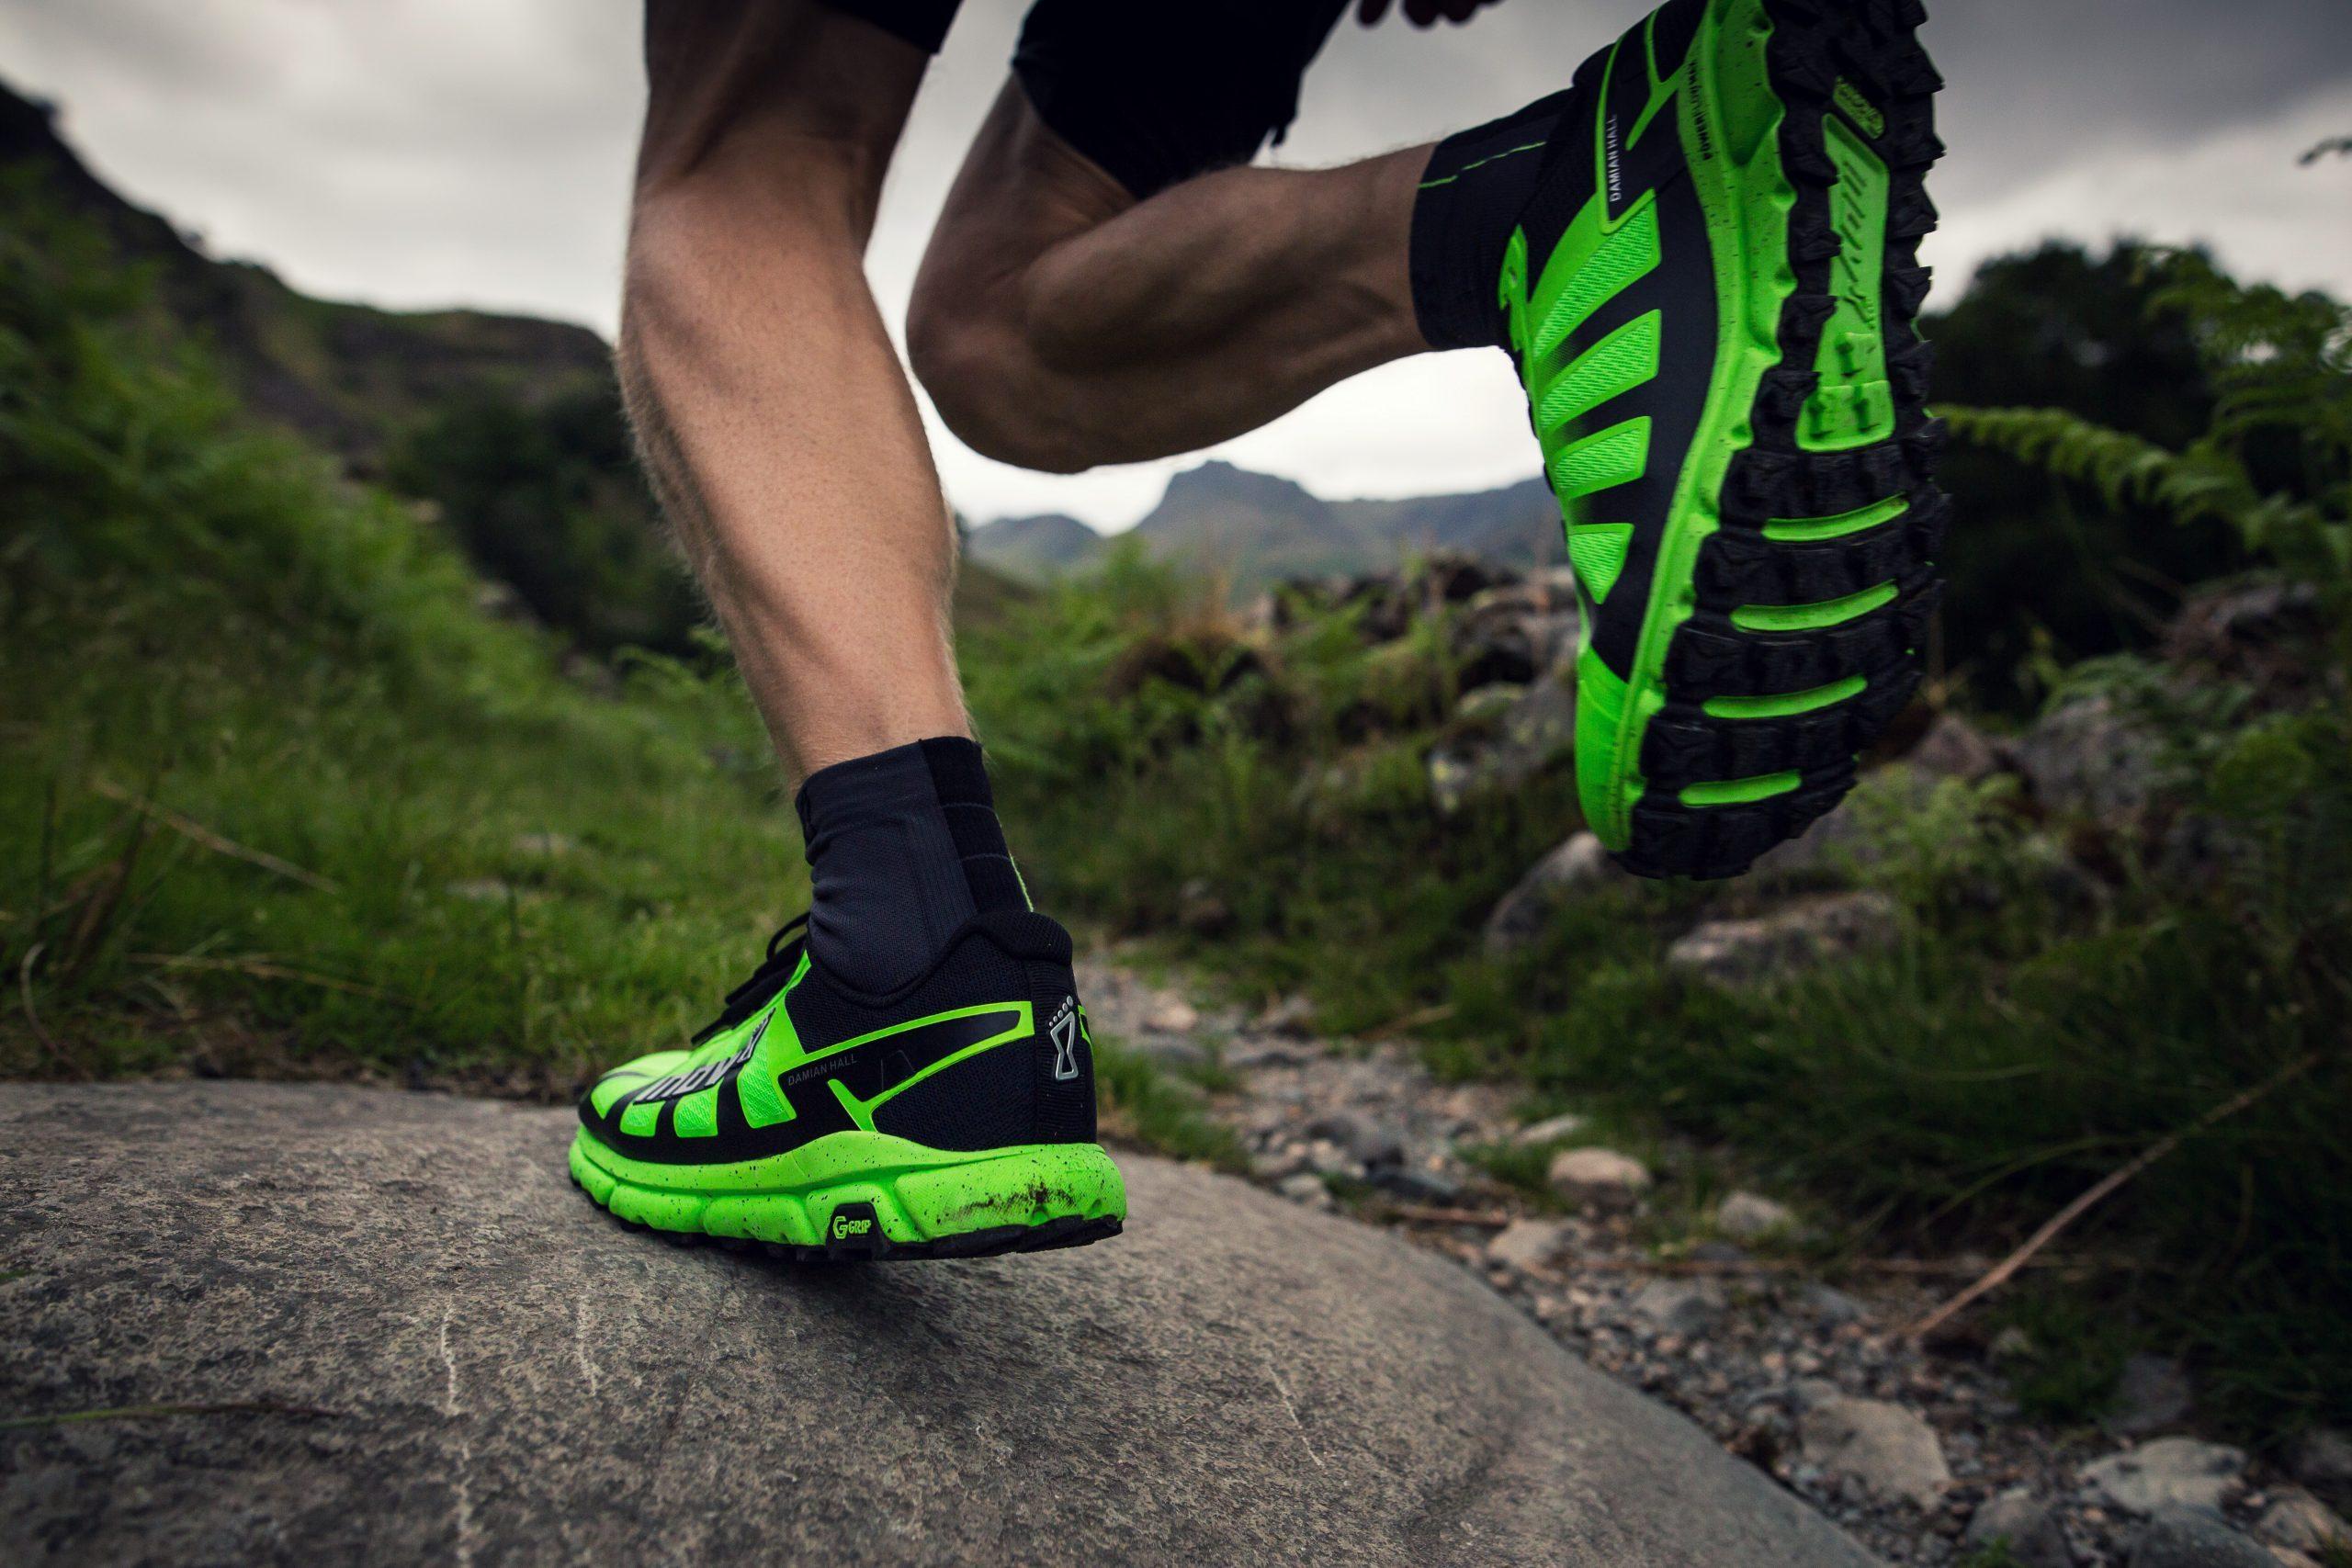 Inov-8 launch new ultra trail run shoe